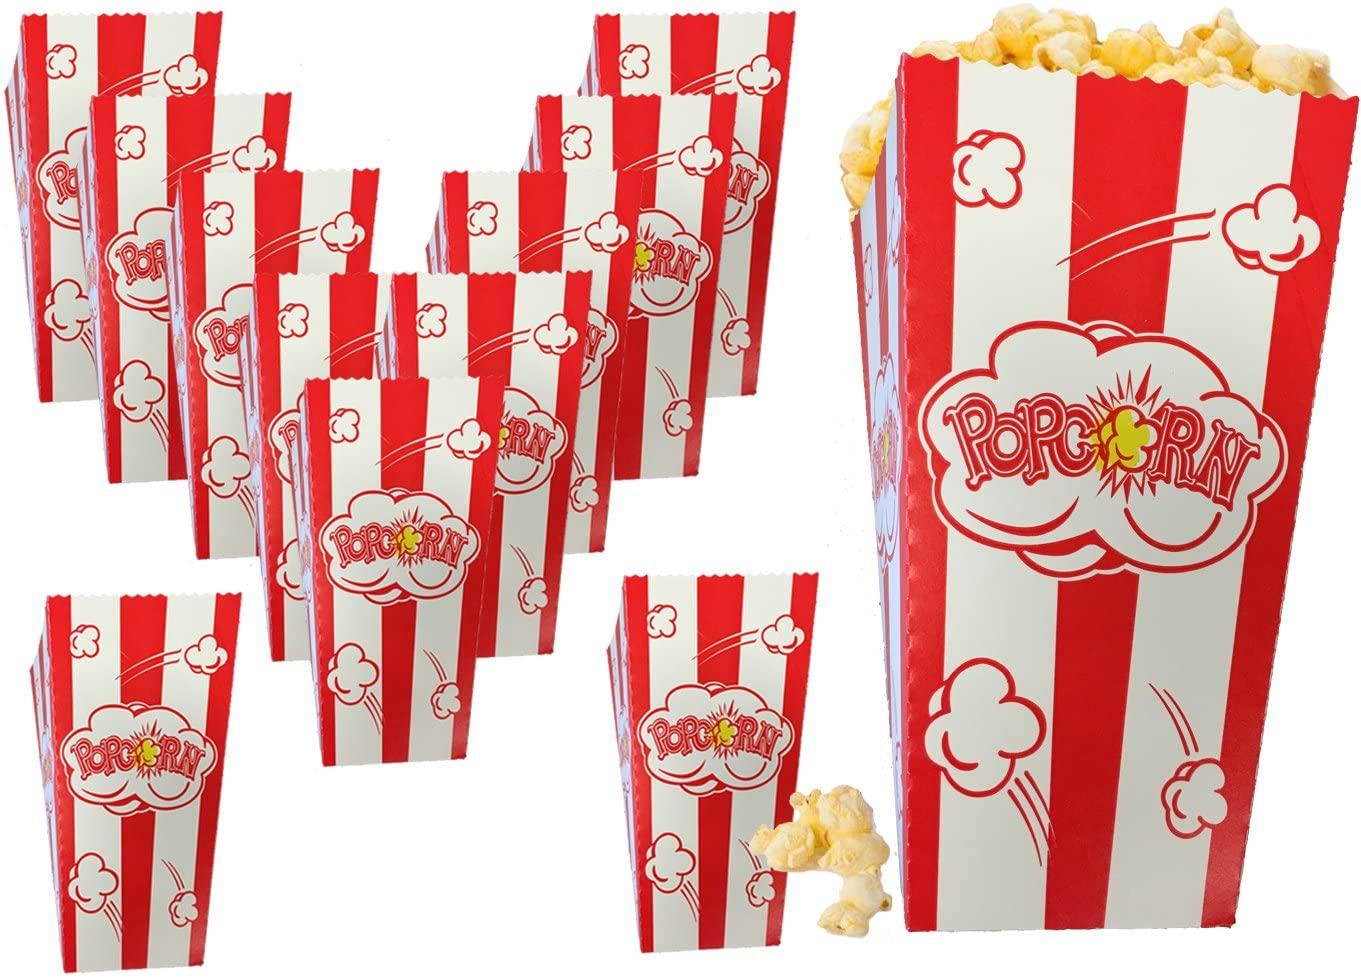 Popcorn Box Small Fresh PopCorn Logo Red White Stripe Classic Party Snack Favor Fun Sized .79 oz Classic style Box (75)